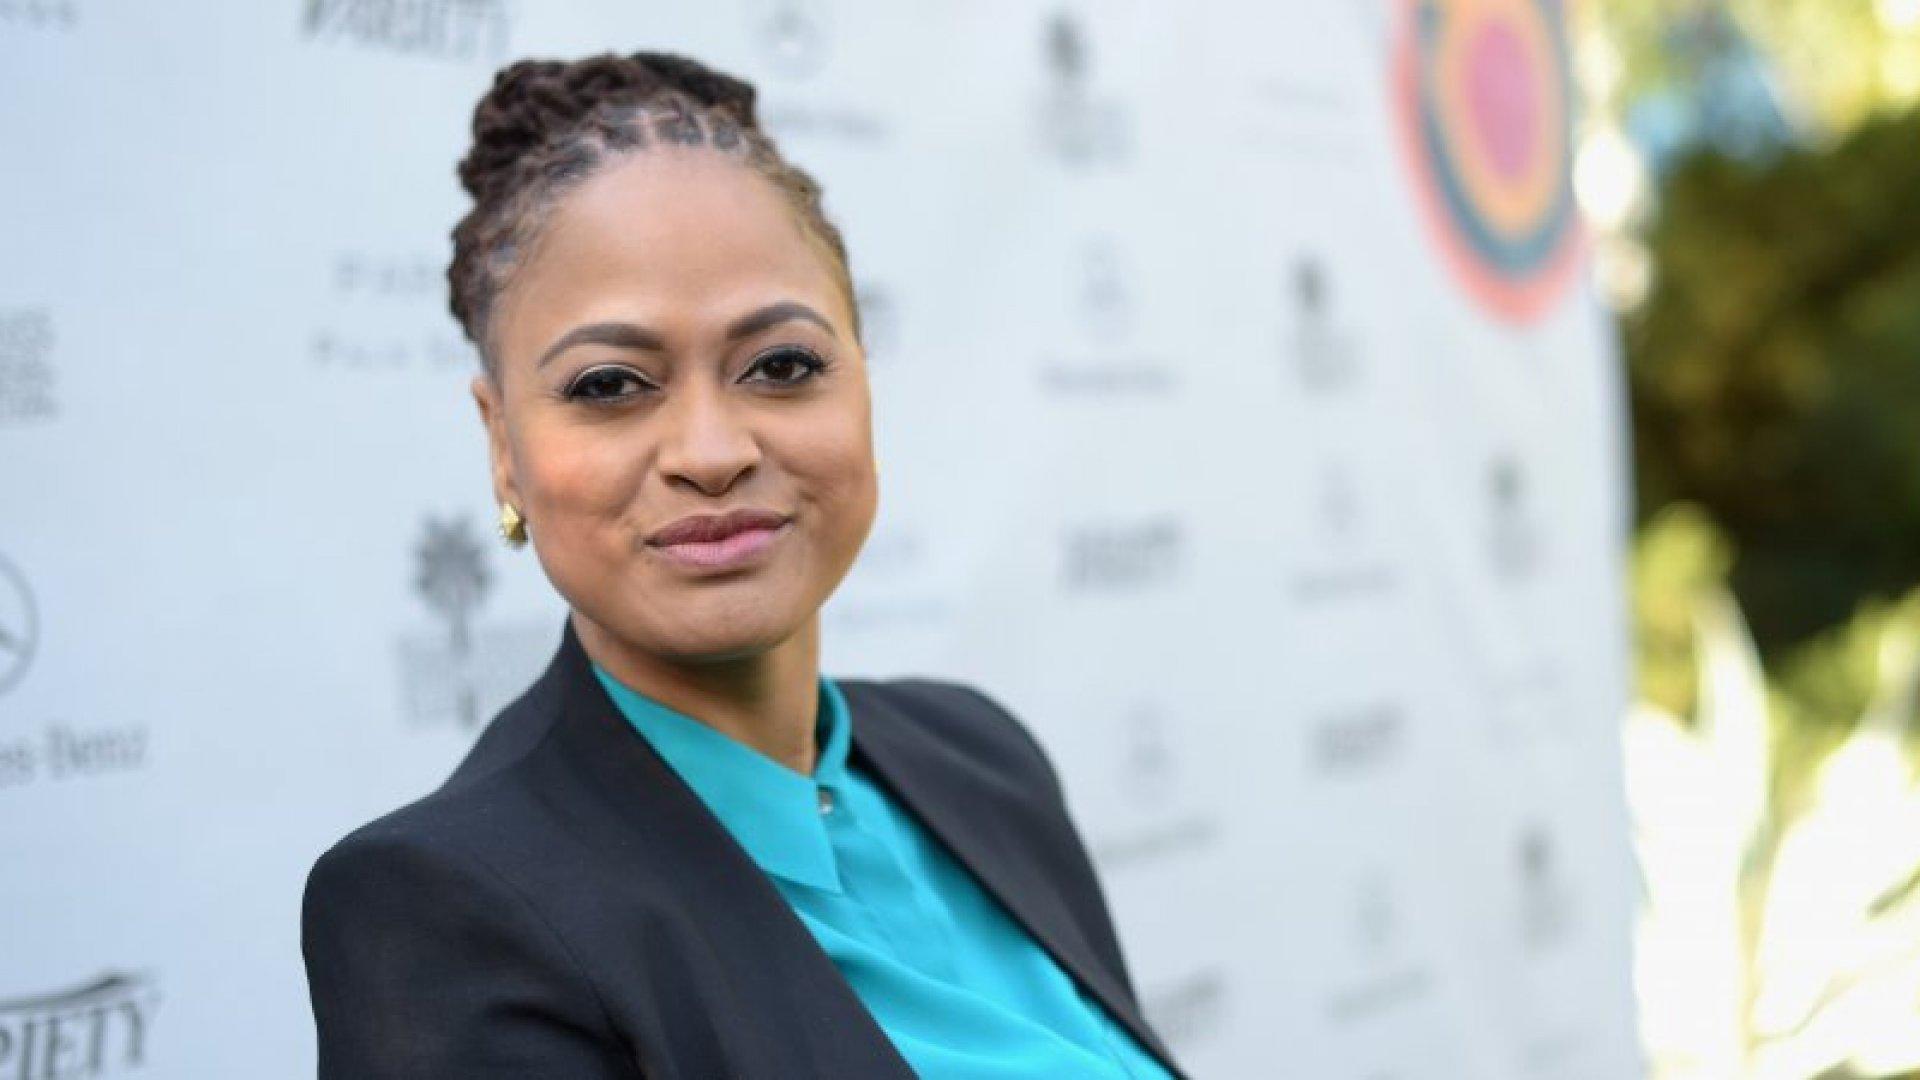 'Selma' Director Ava DuVernay Takes On Hollywood's Gender Gap